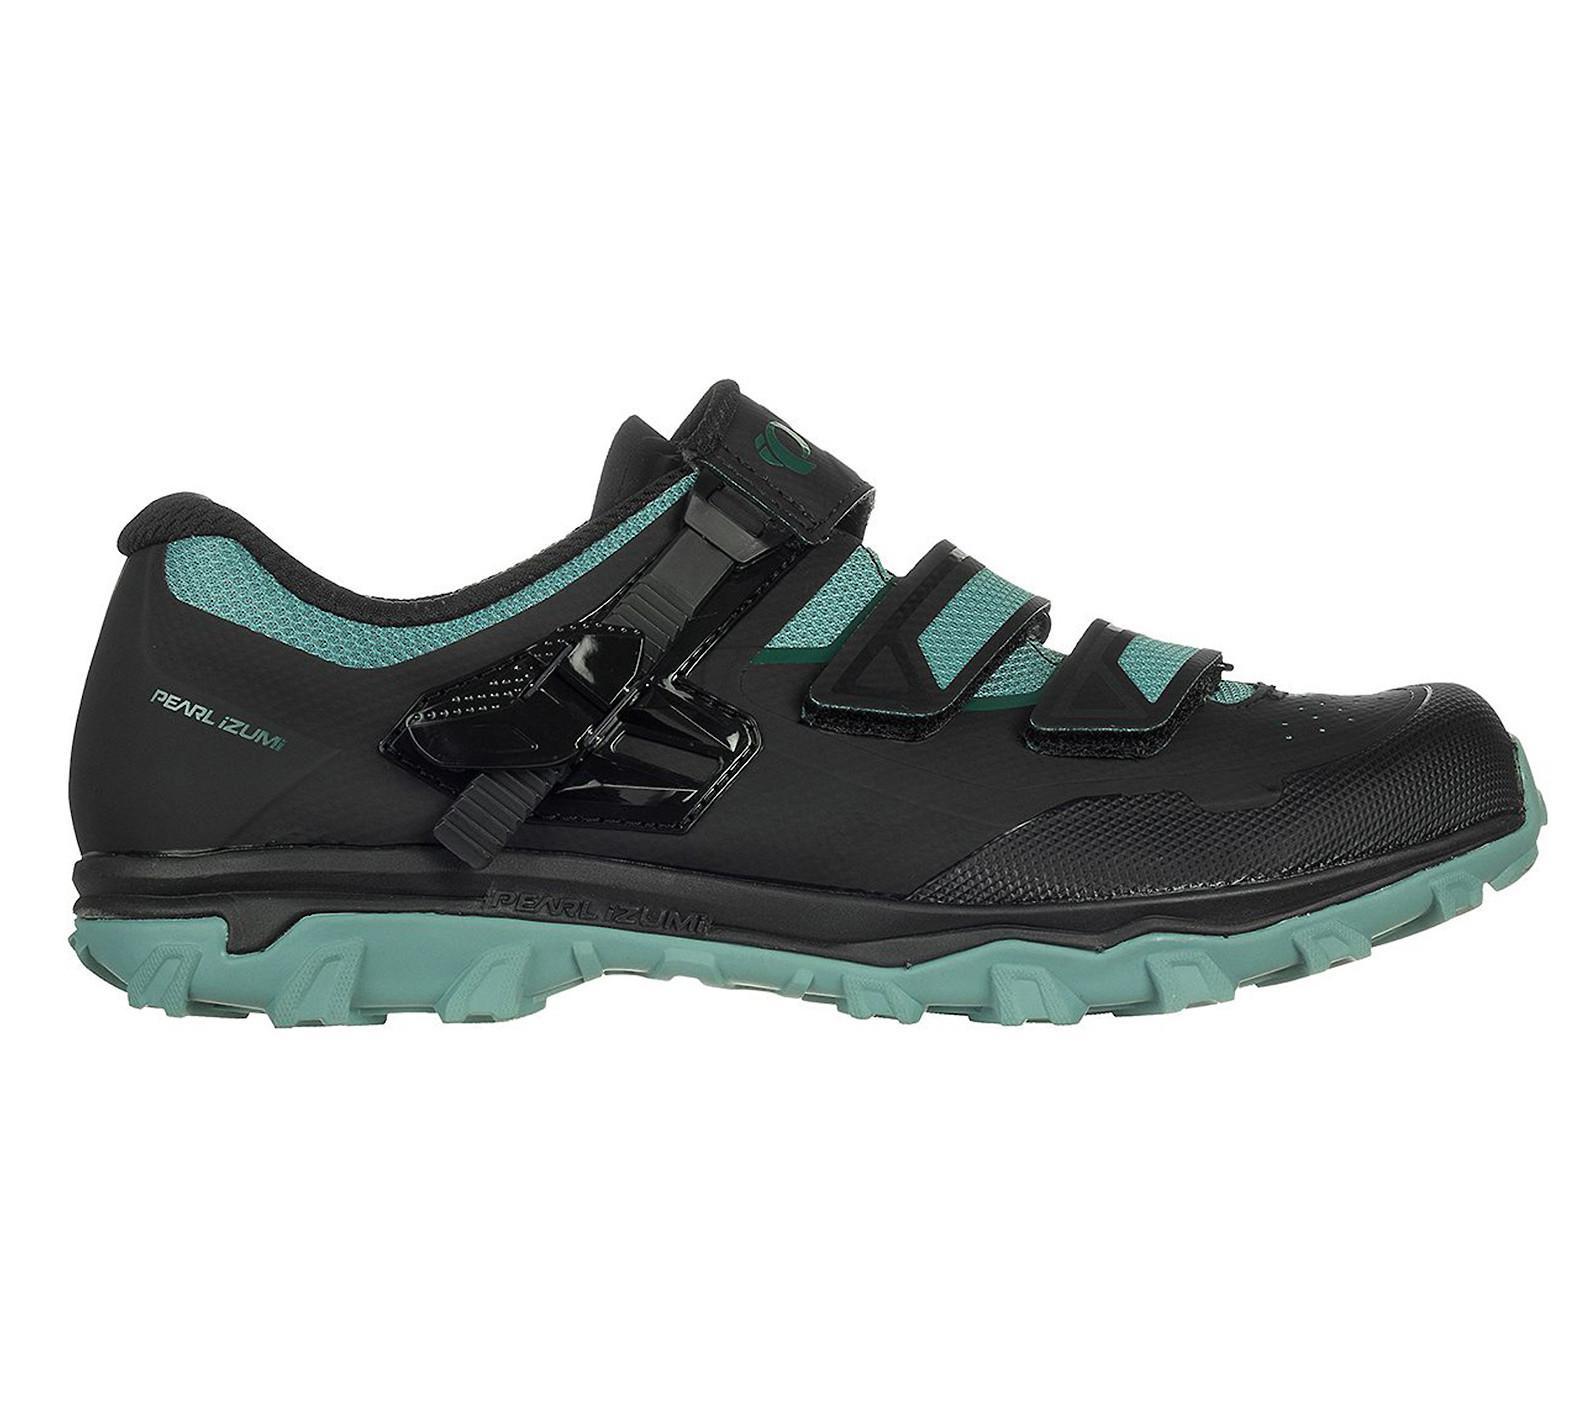 Pearl Izumi X-ALP Summit men's shoe in arctic/black